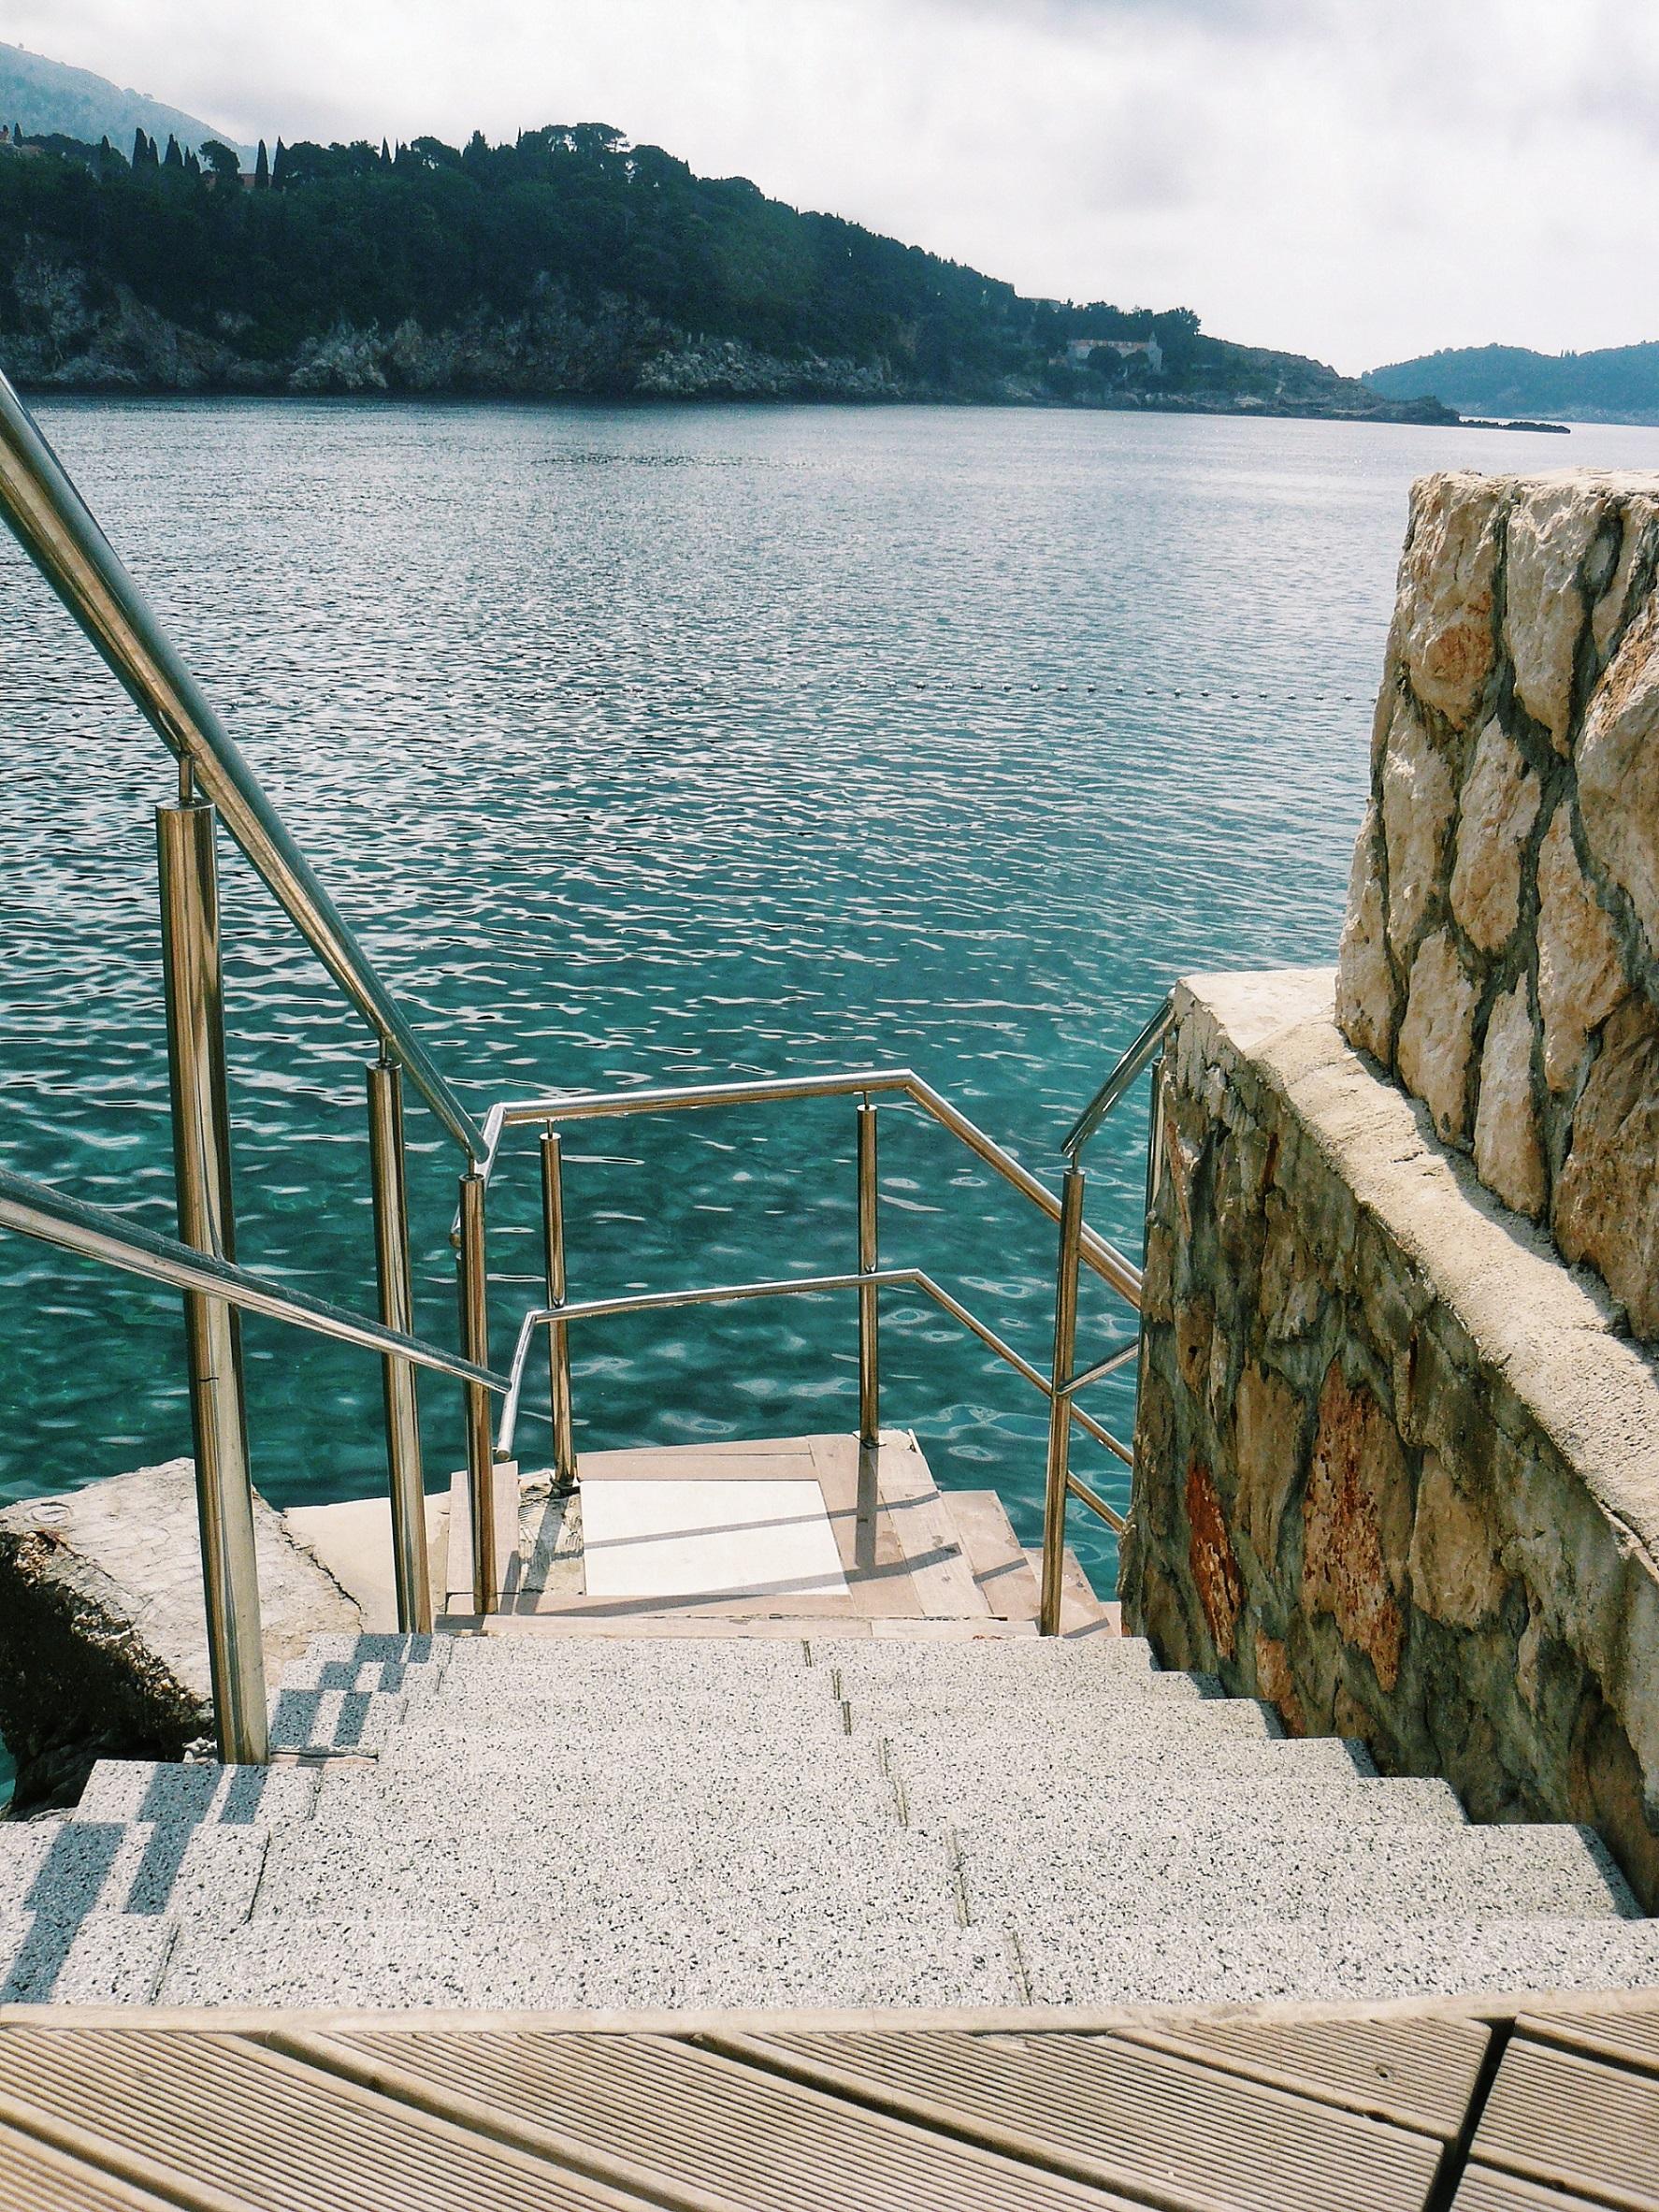 Outlandish blog travel Dubrovnik Croatia holiday